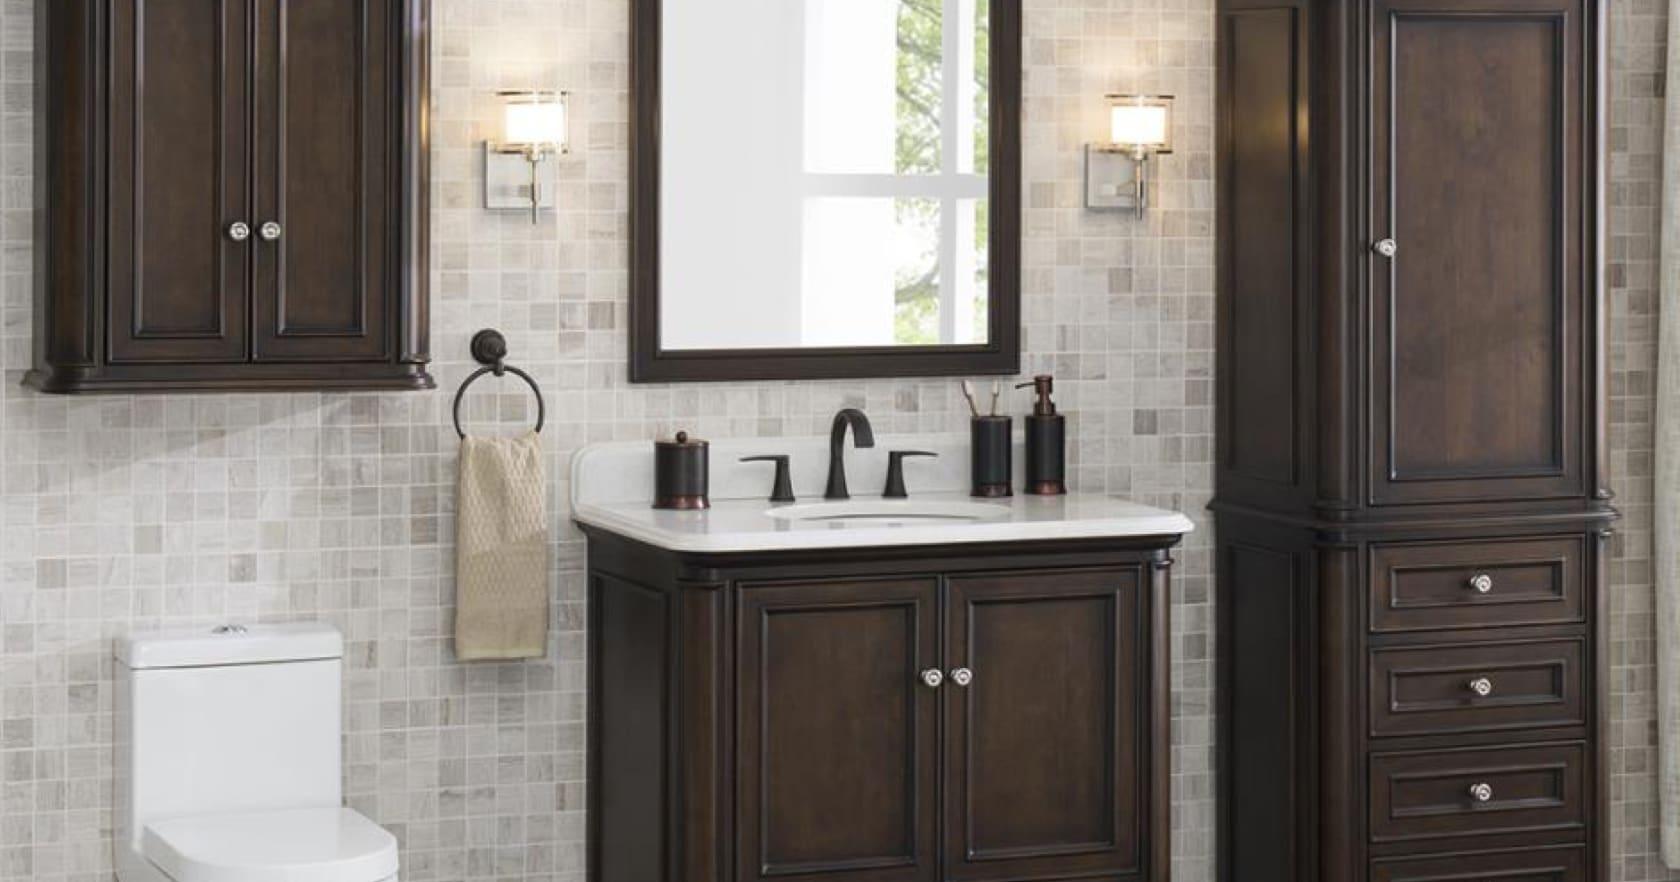 Bathroom Storage, Bathroom Shelving Cabinet